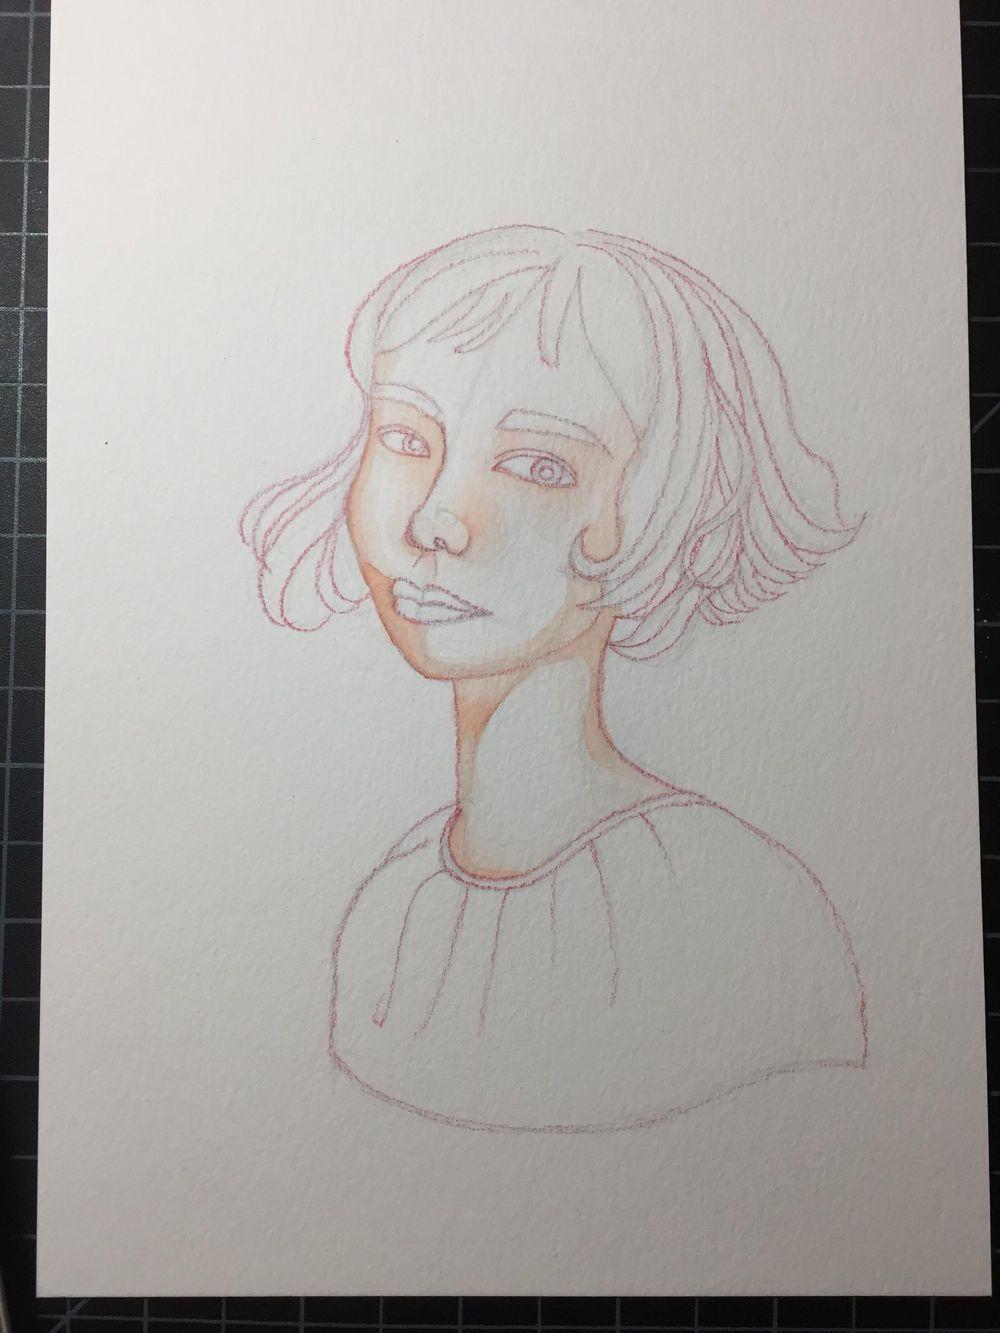 Rainbow Skin Portrait - image 1 - student project